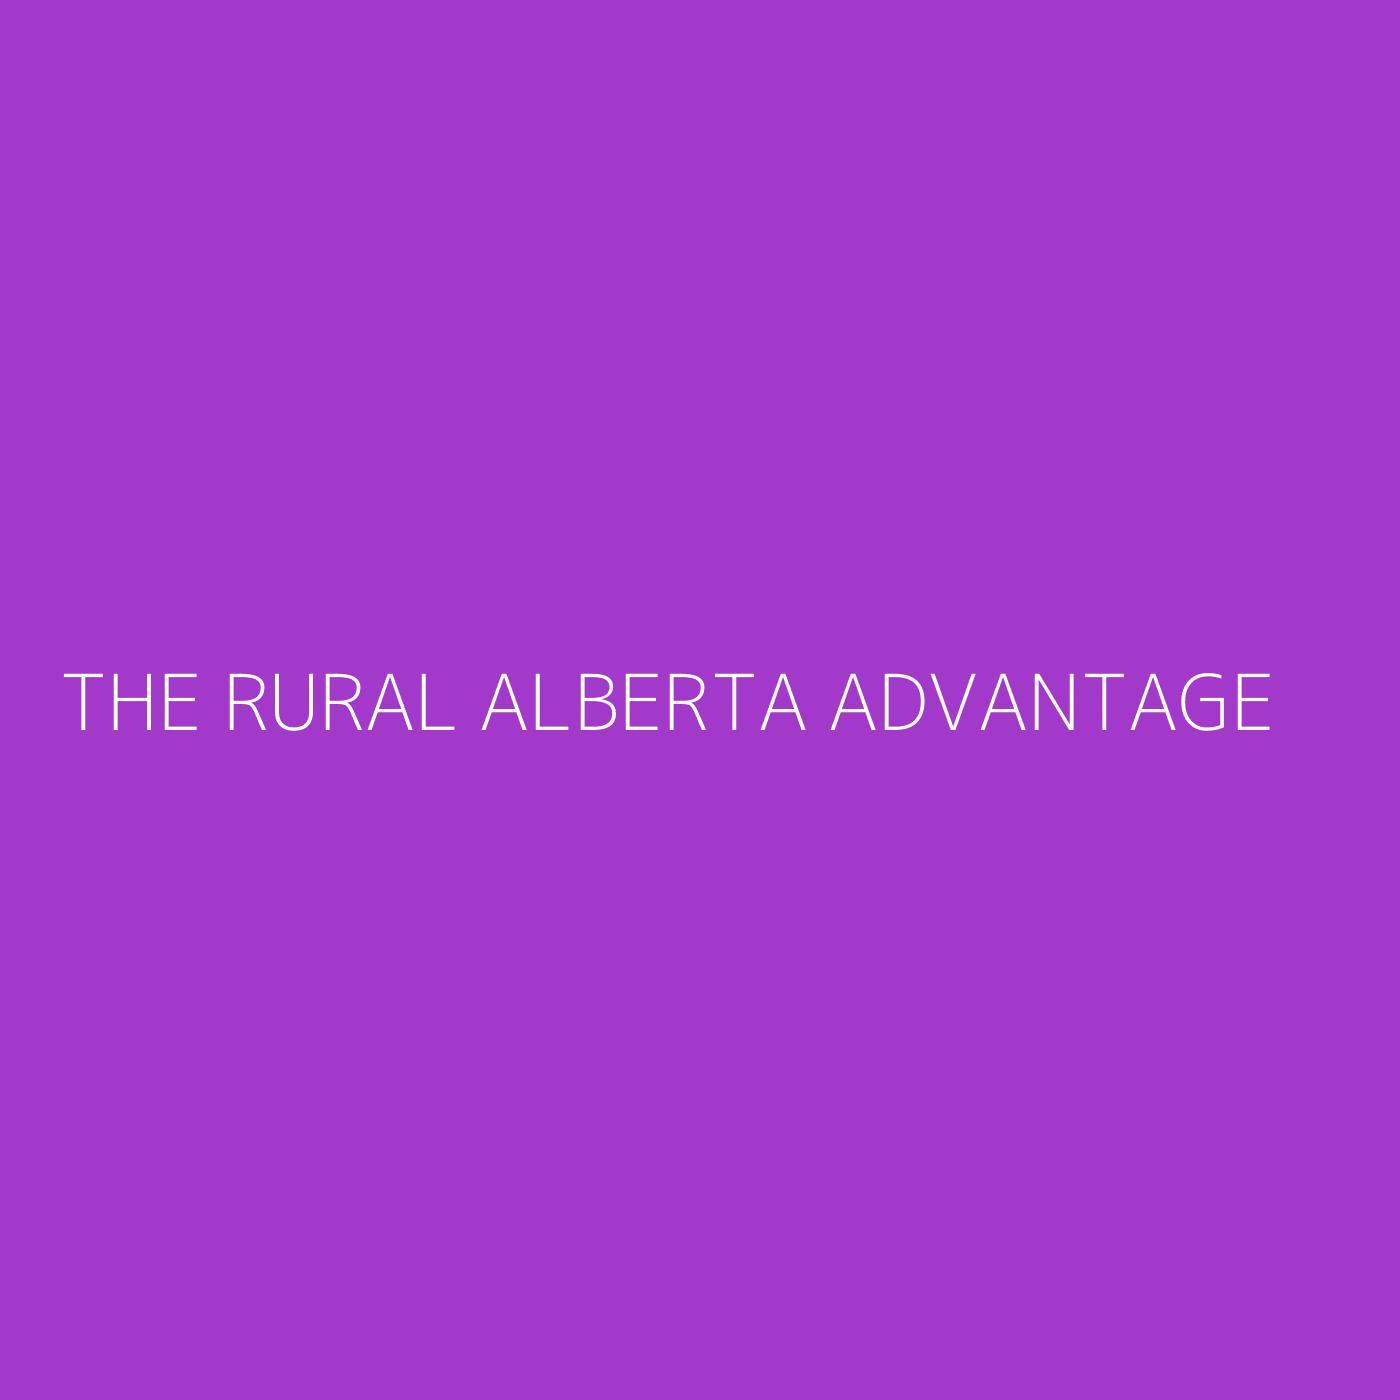 The Rural Alberta Advantage Playlist Artwork